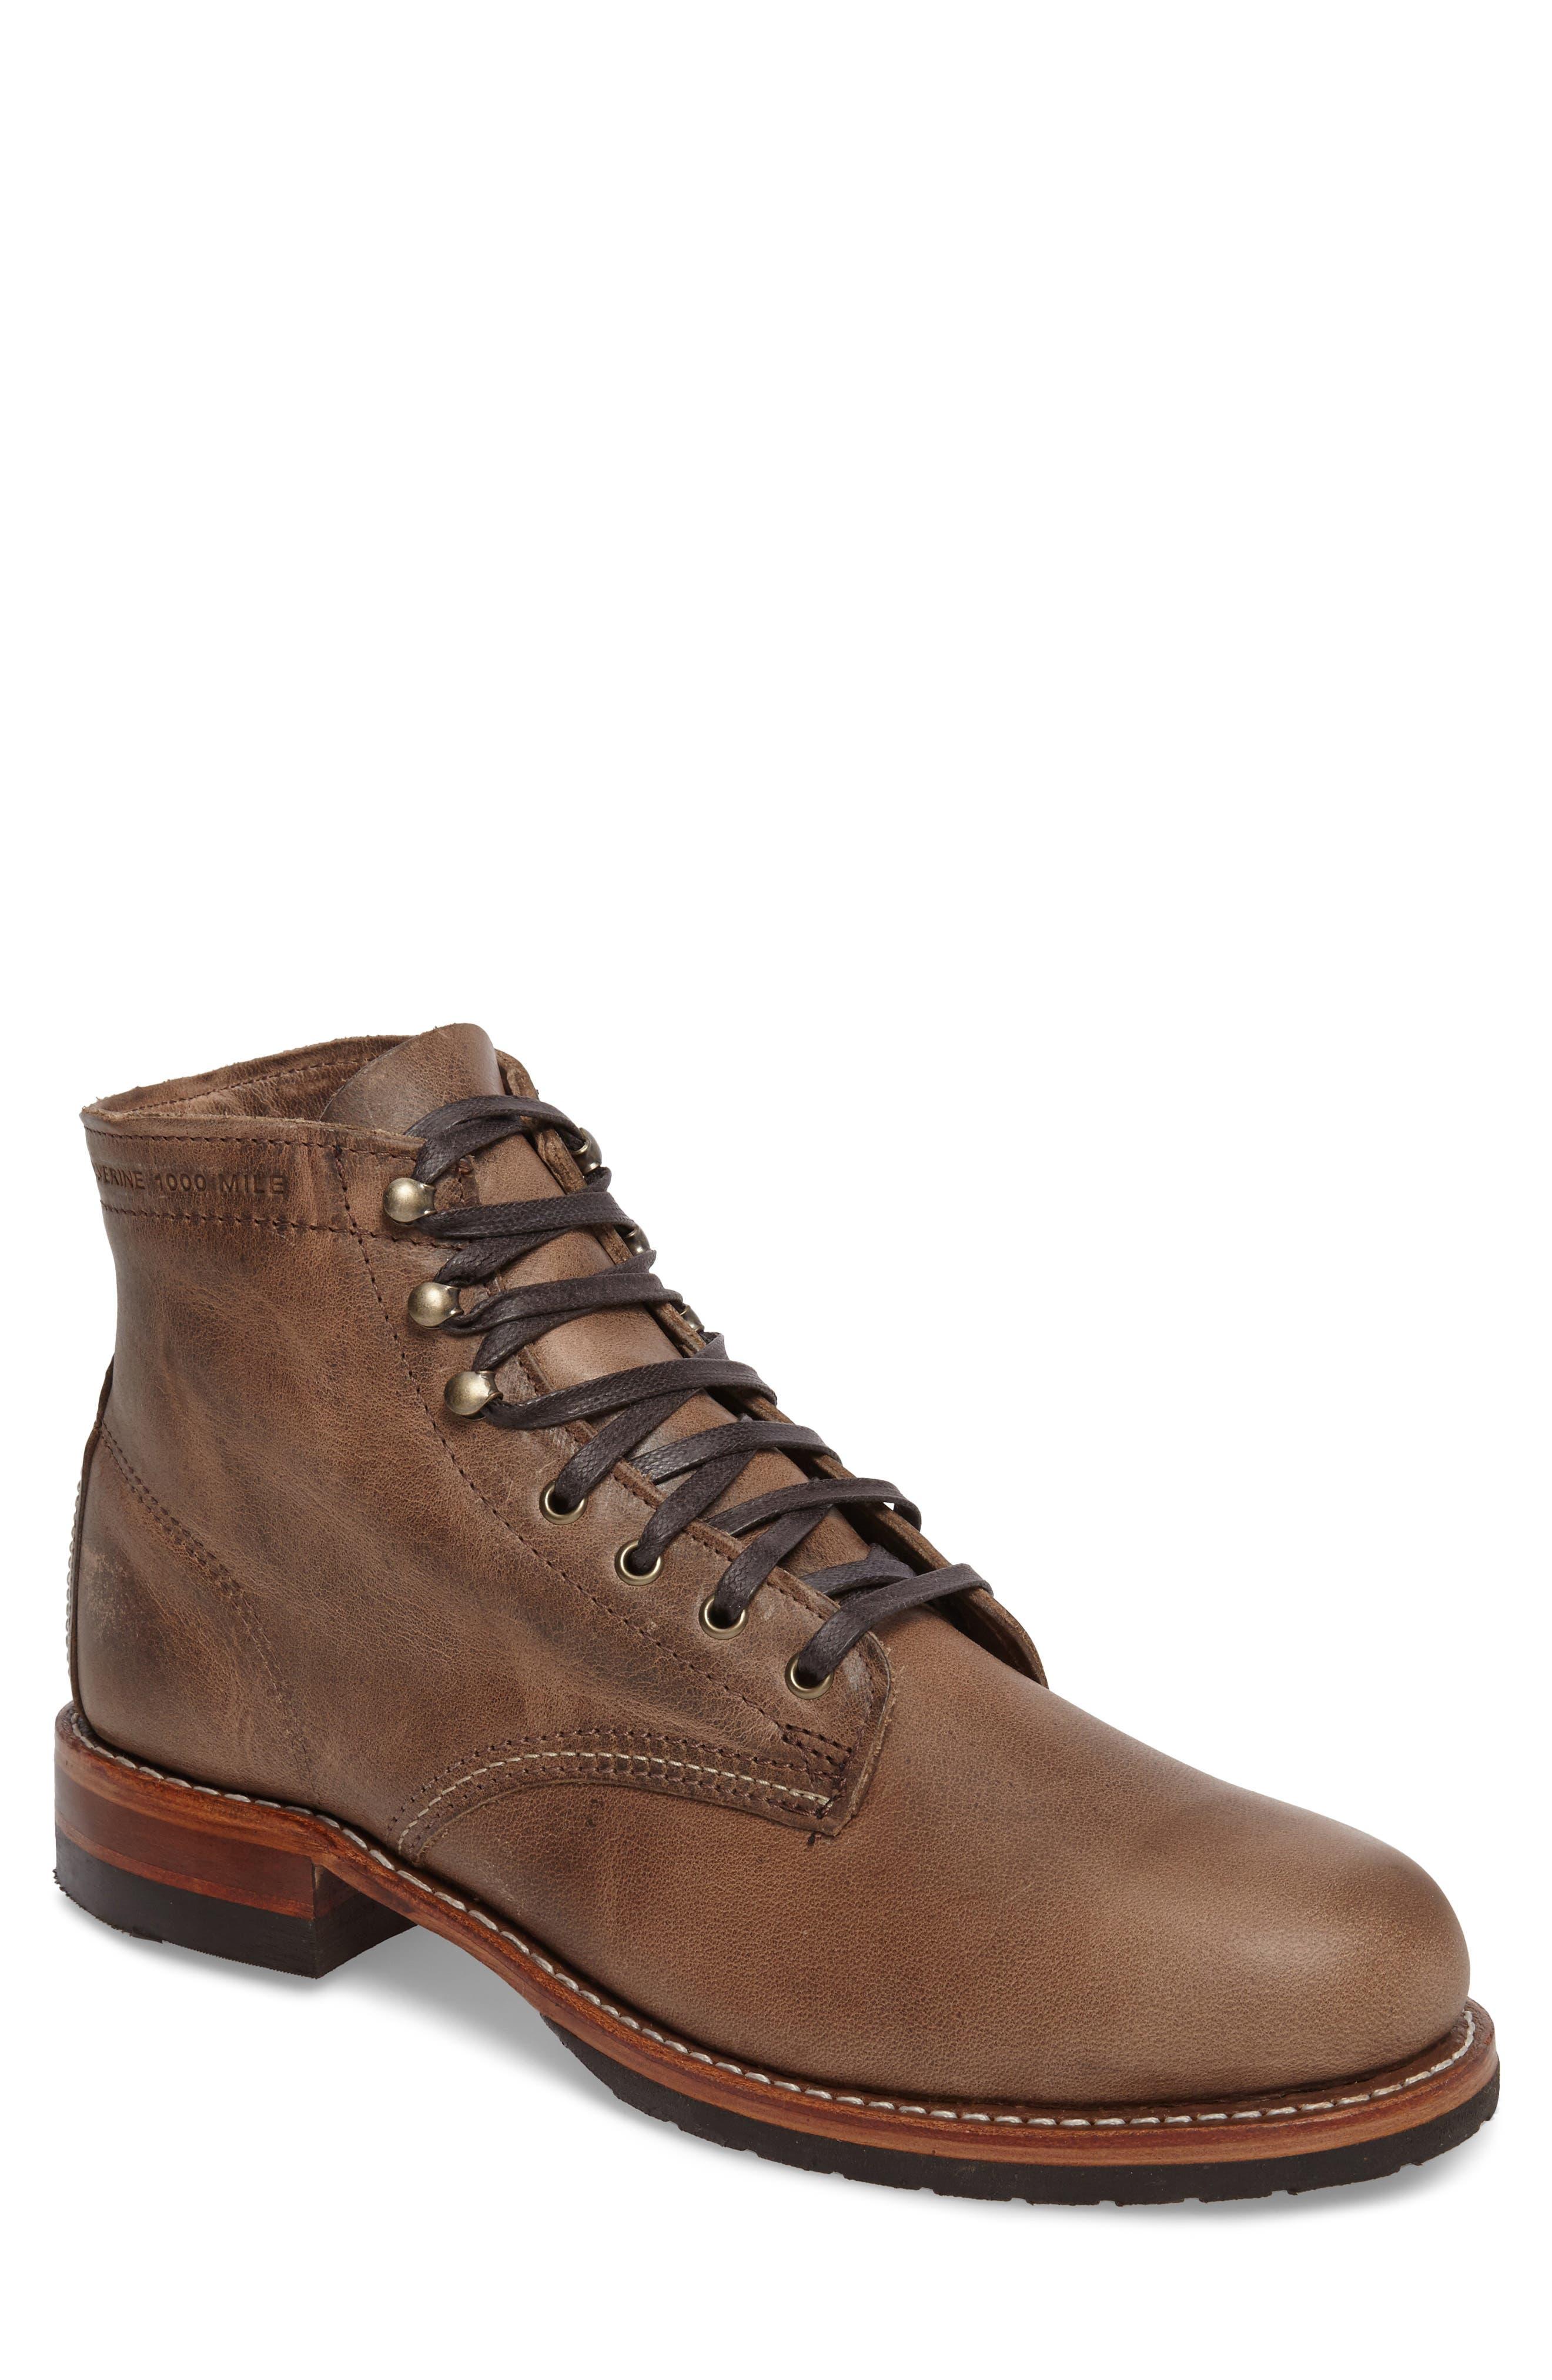 Wolverine Evans Plain Toe Boot